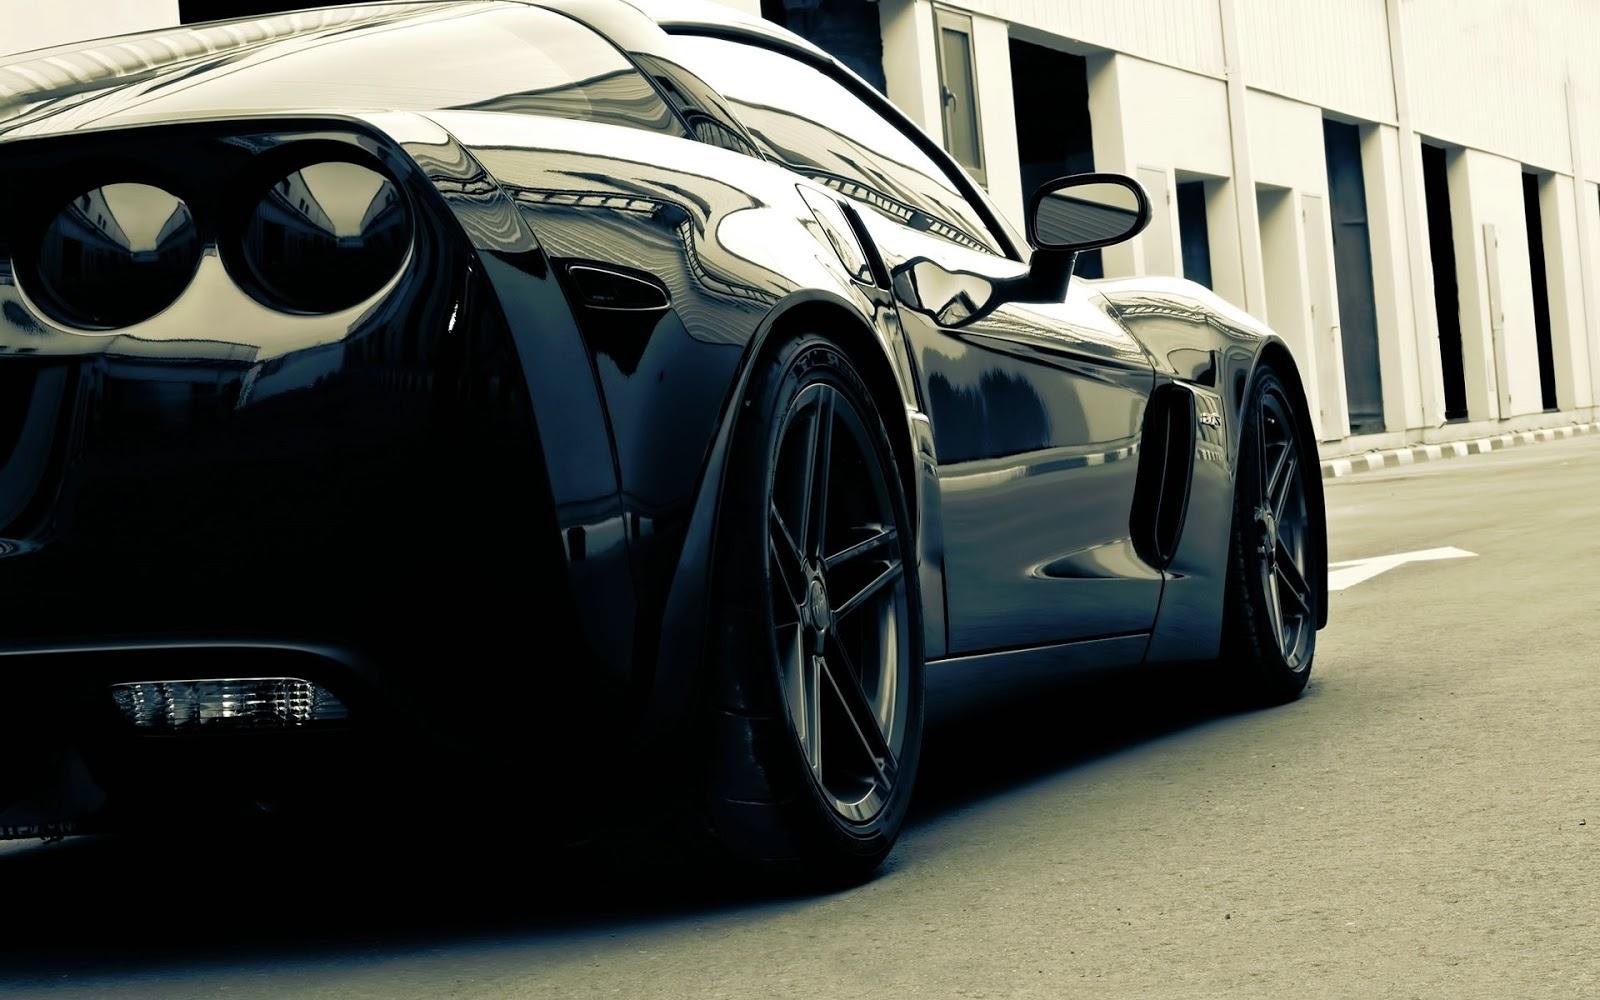 Attractive Title : Black Corvette Sport Car Hd Wallpaper Desktop Full For Of  Smartphone. Dimension : 1600 X 1000. File Type : JPG/JPEG